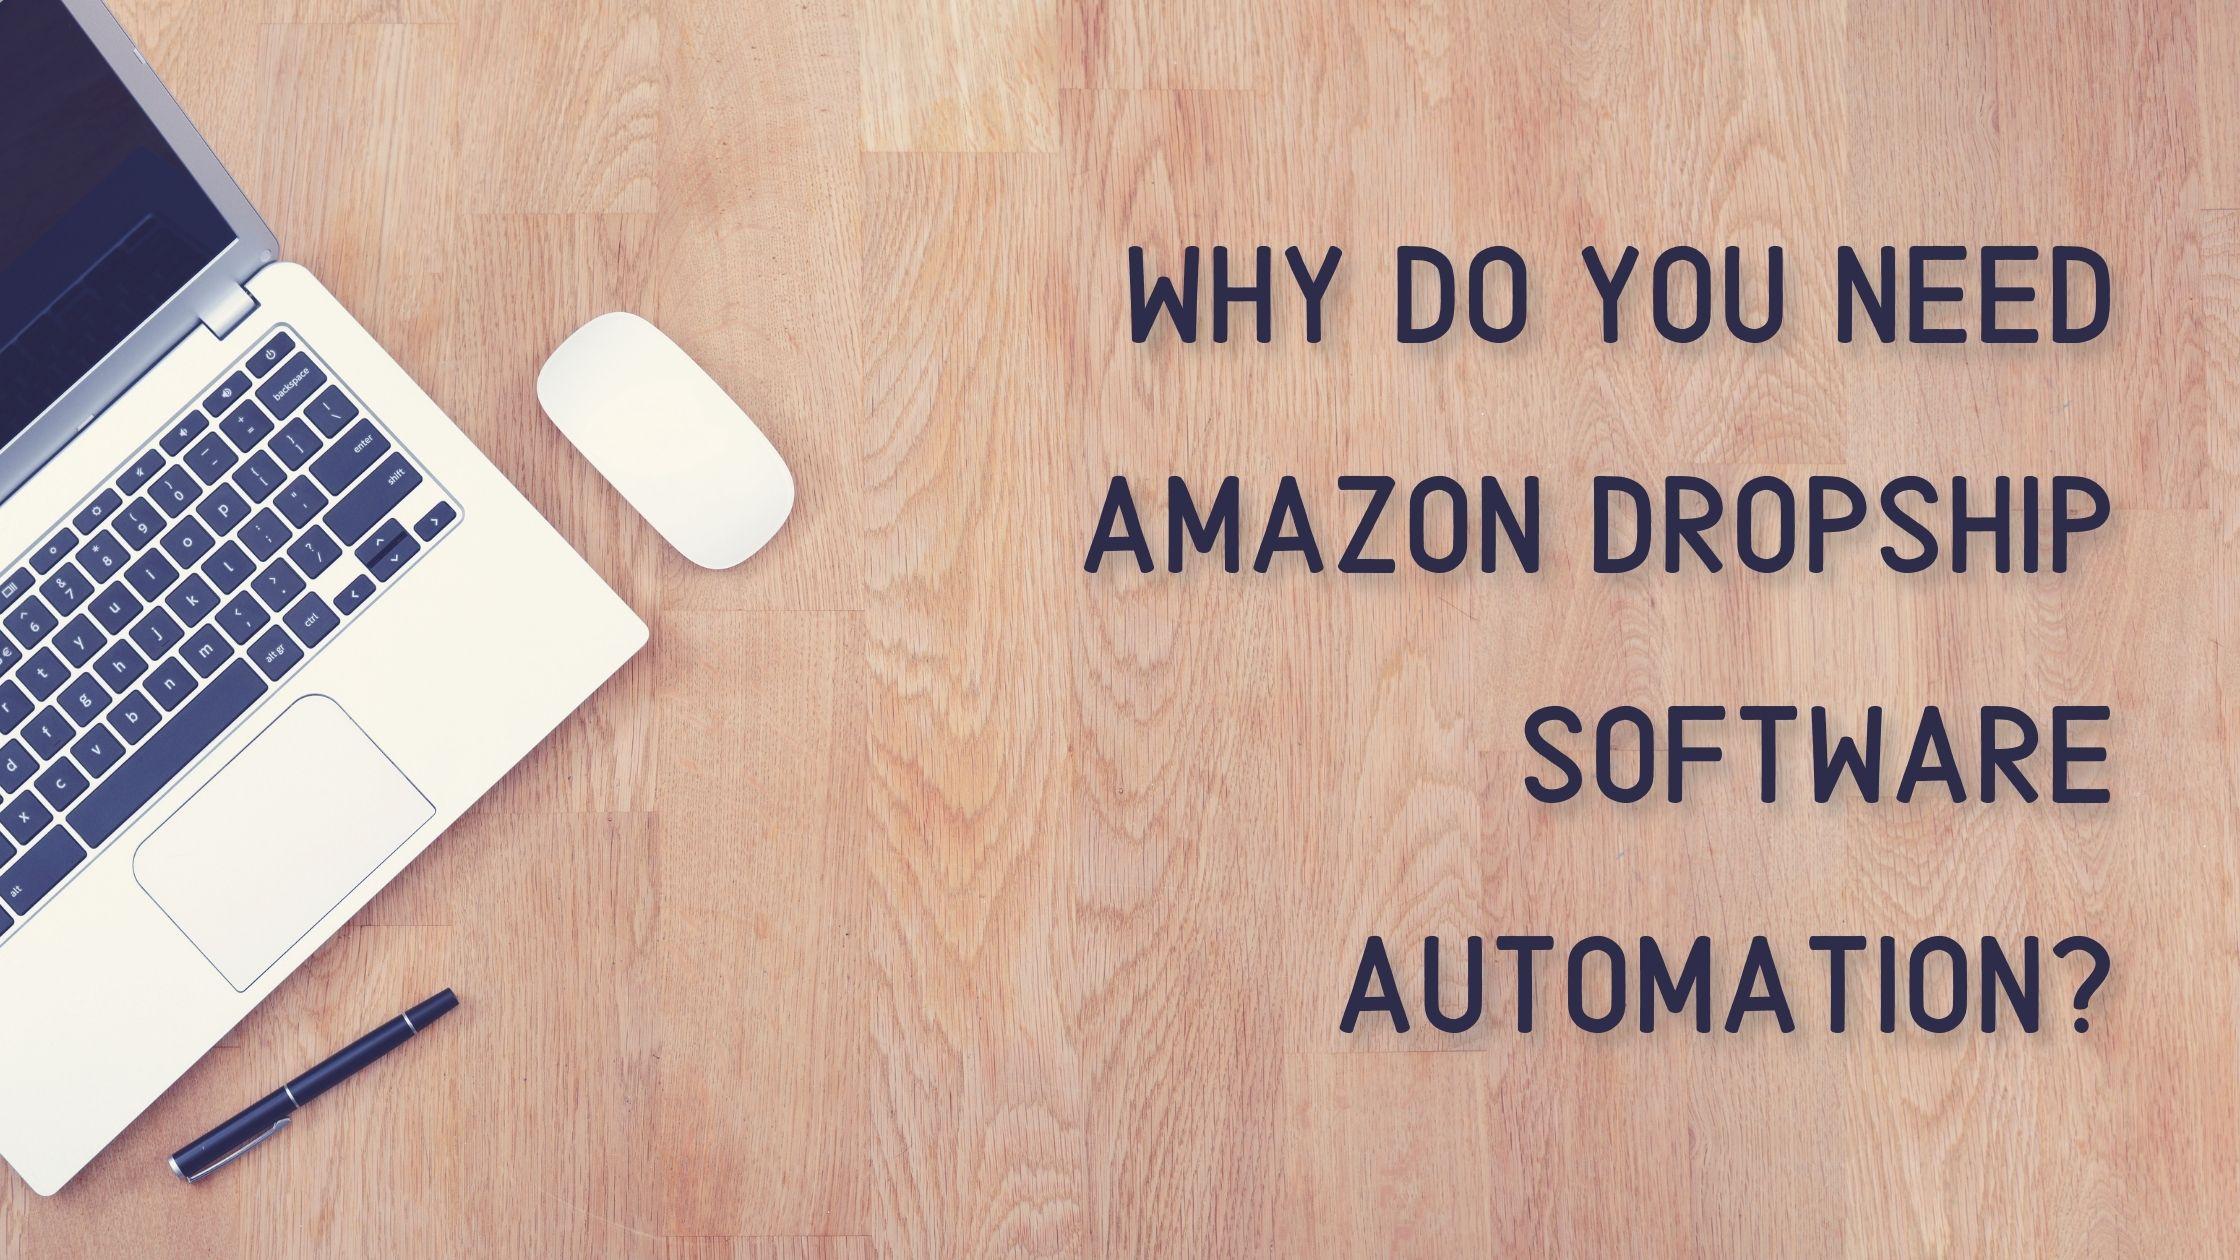 Amazon Dropship Software Automation